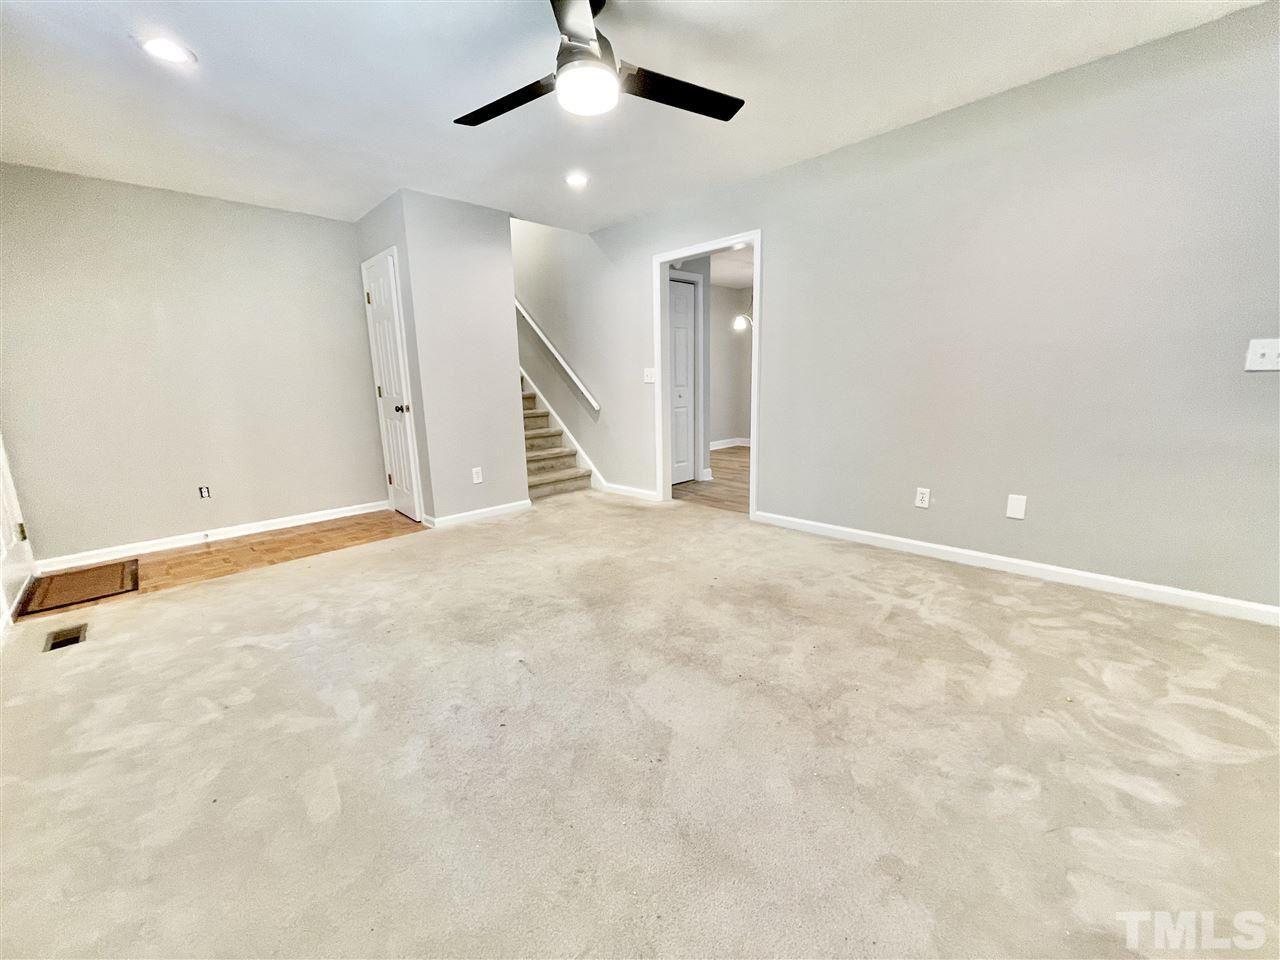 Photo of 216 Trillingham Lane, Cary, NC 27513 (MLS # 2399278)